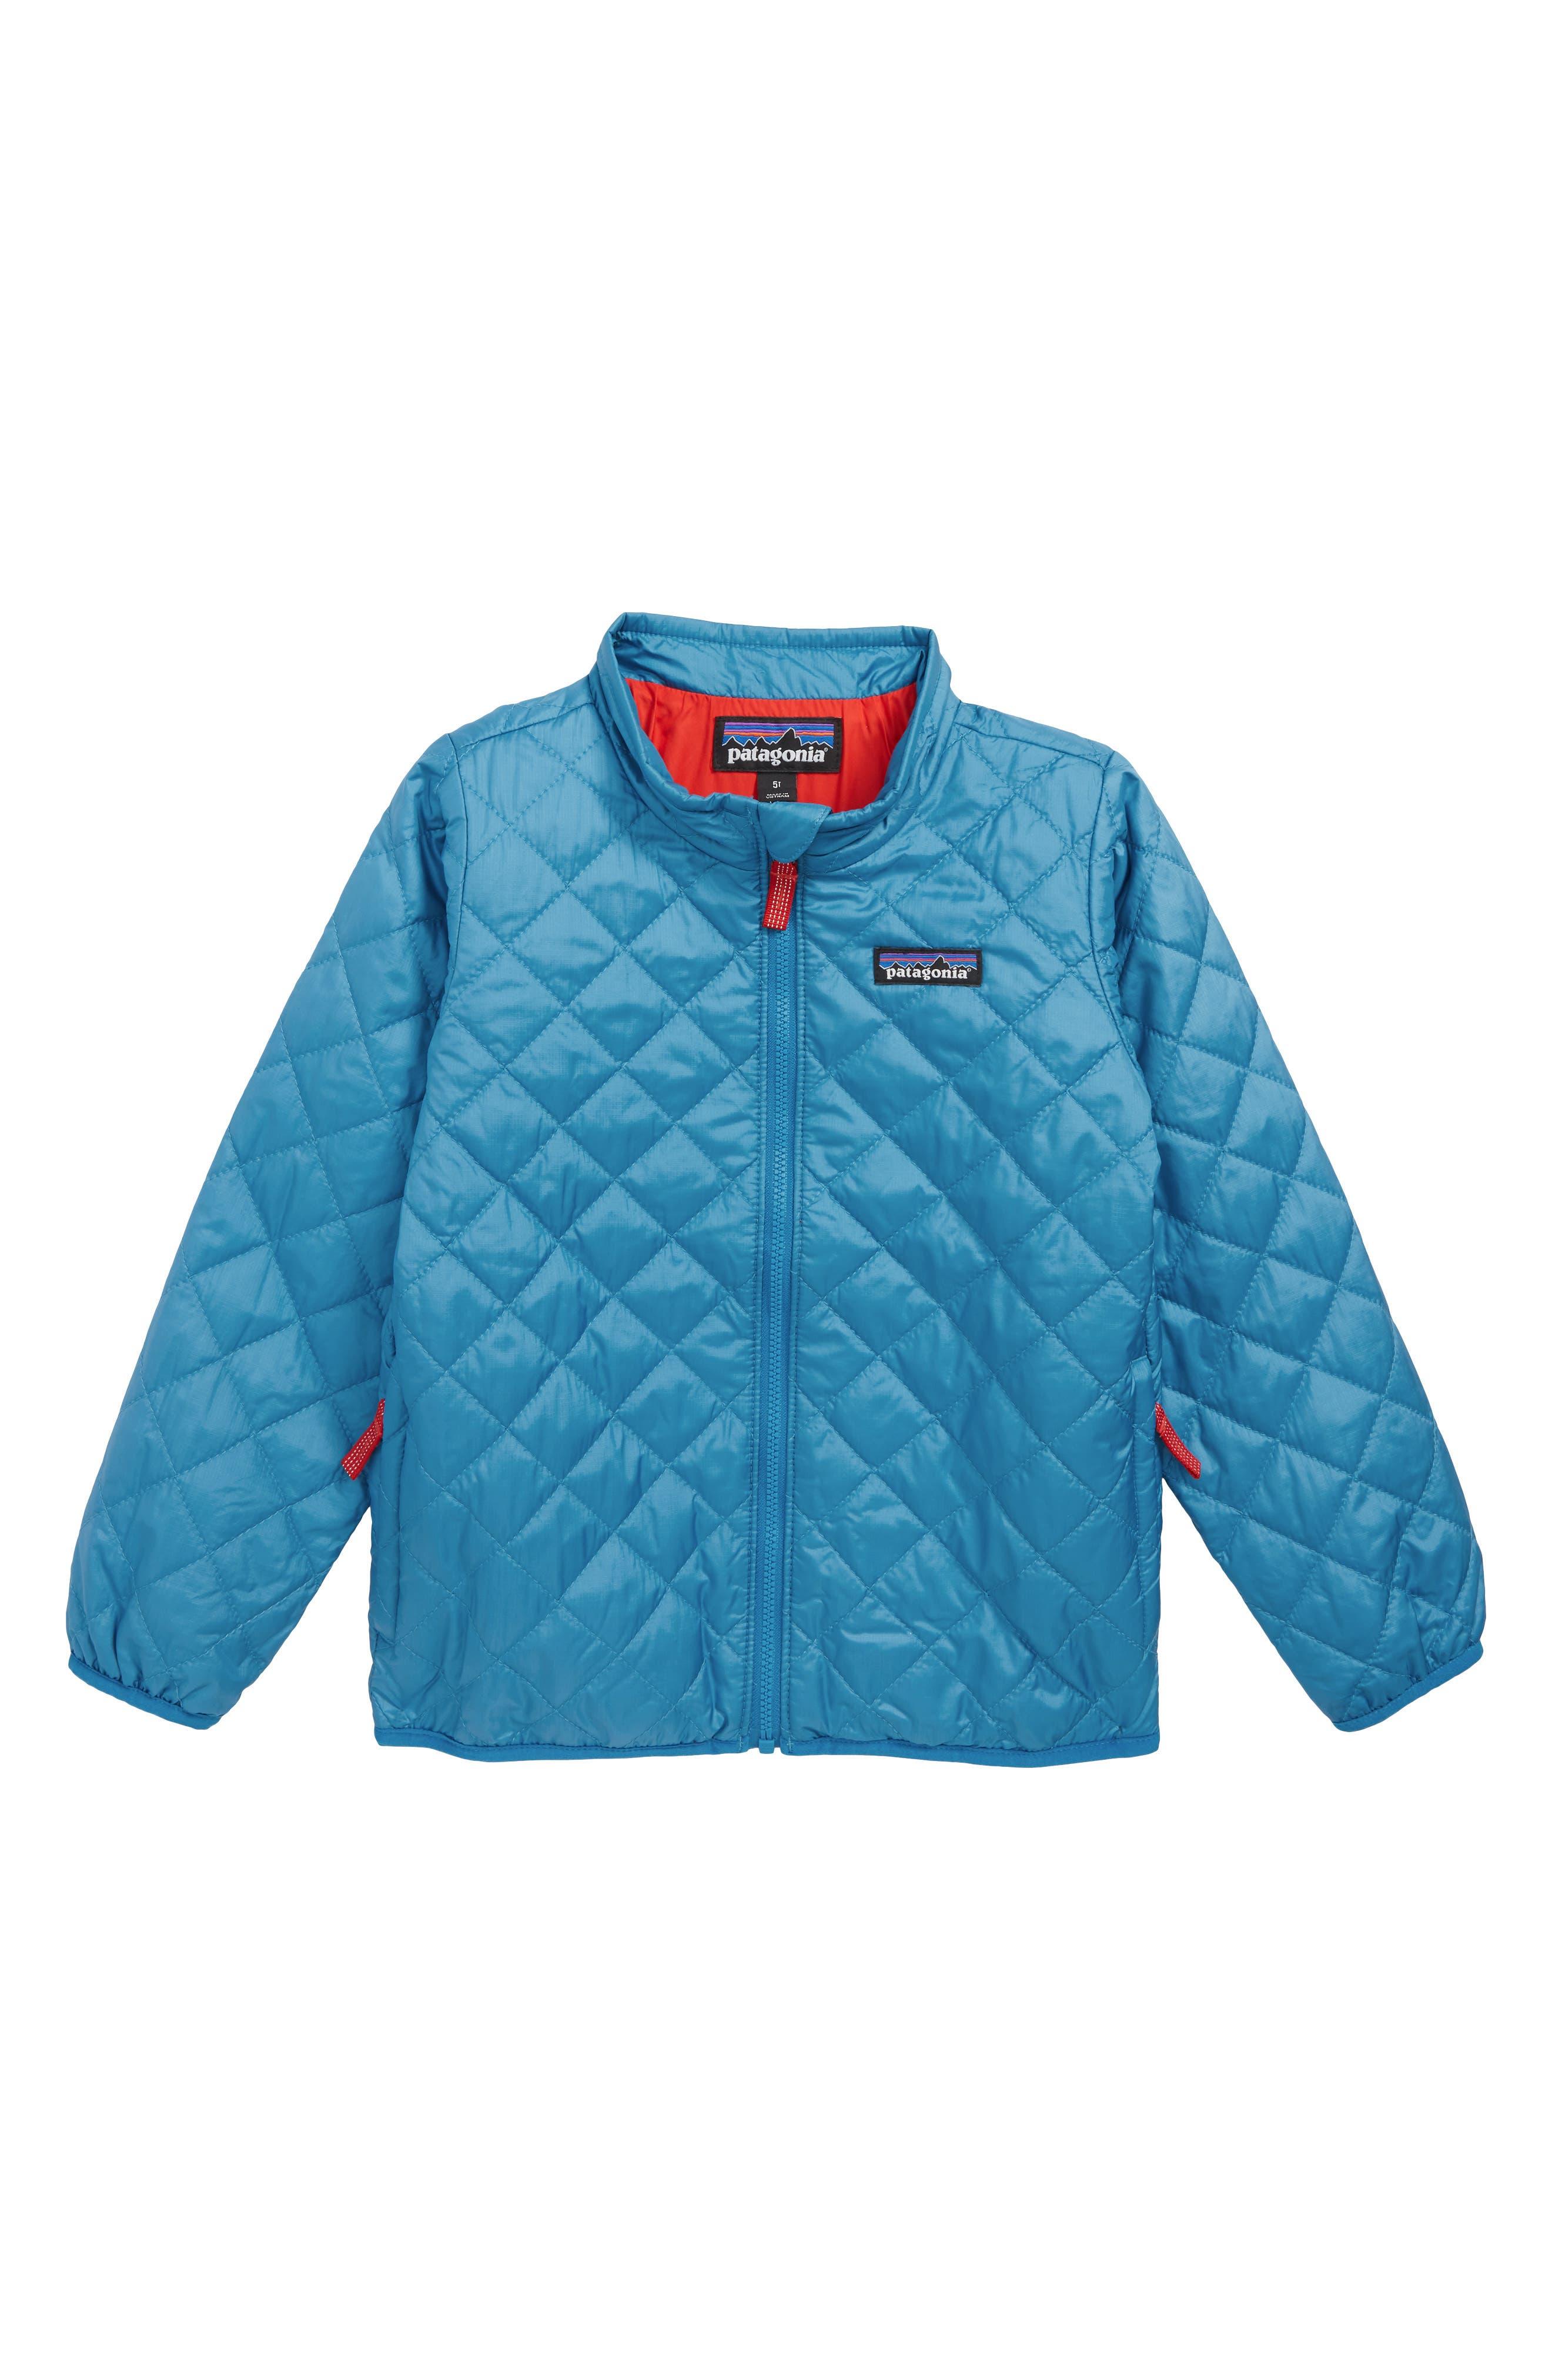 PATAGONIA,                             Nano Puff<sup>®</sup> Quilted Water Resistant Jacket,                             Main thumbnail 1, color,                             BALKAN BLUE